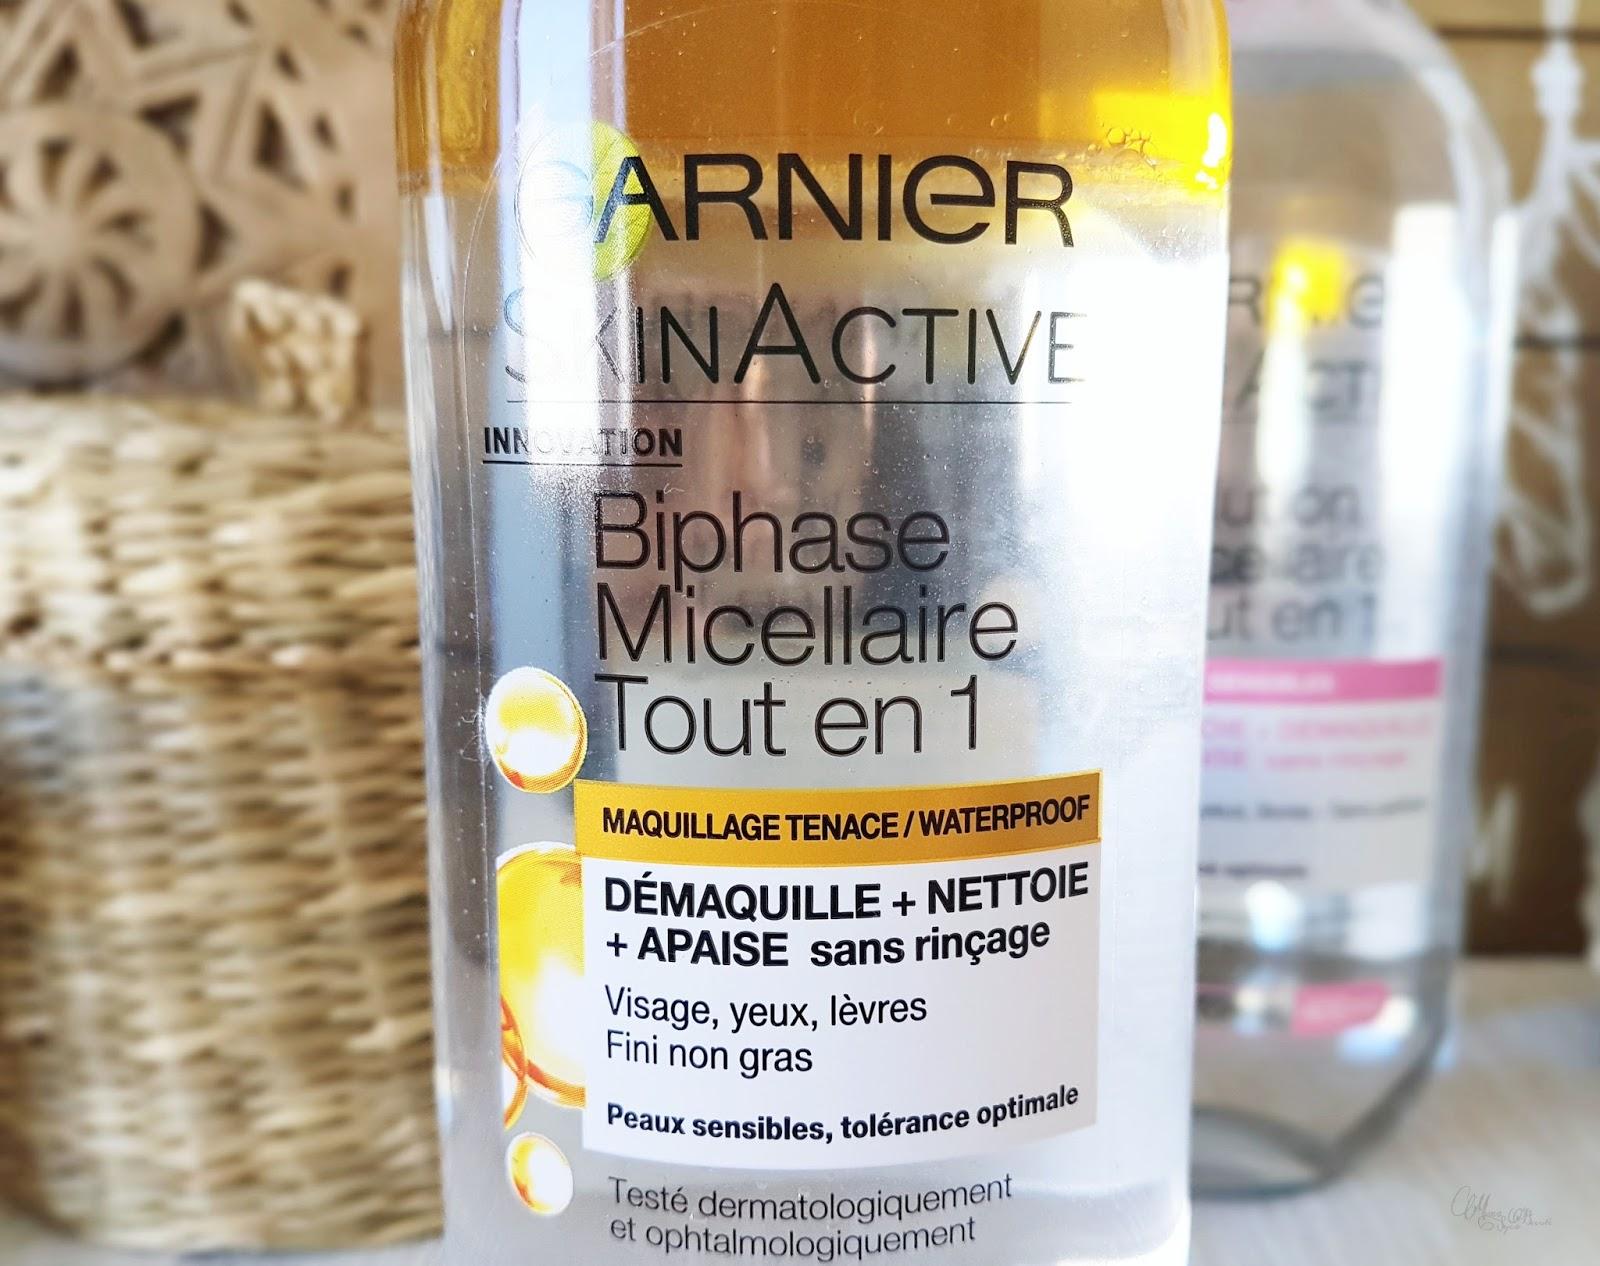 avis-biphase-micellaire-garnier-skinactive